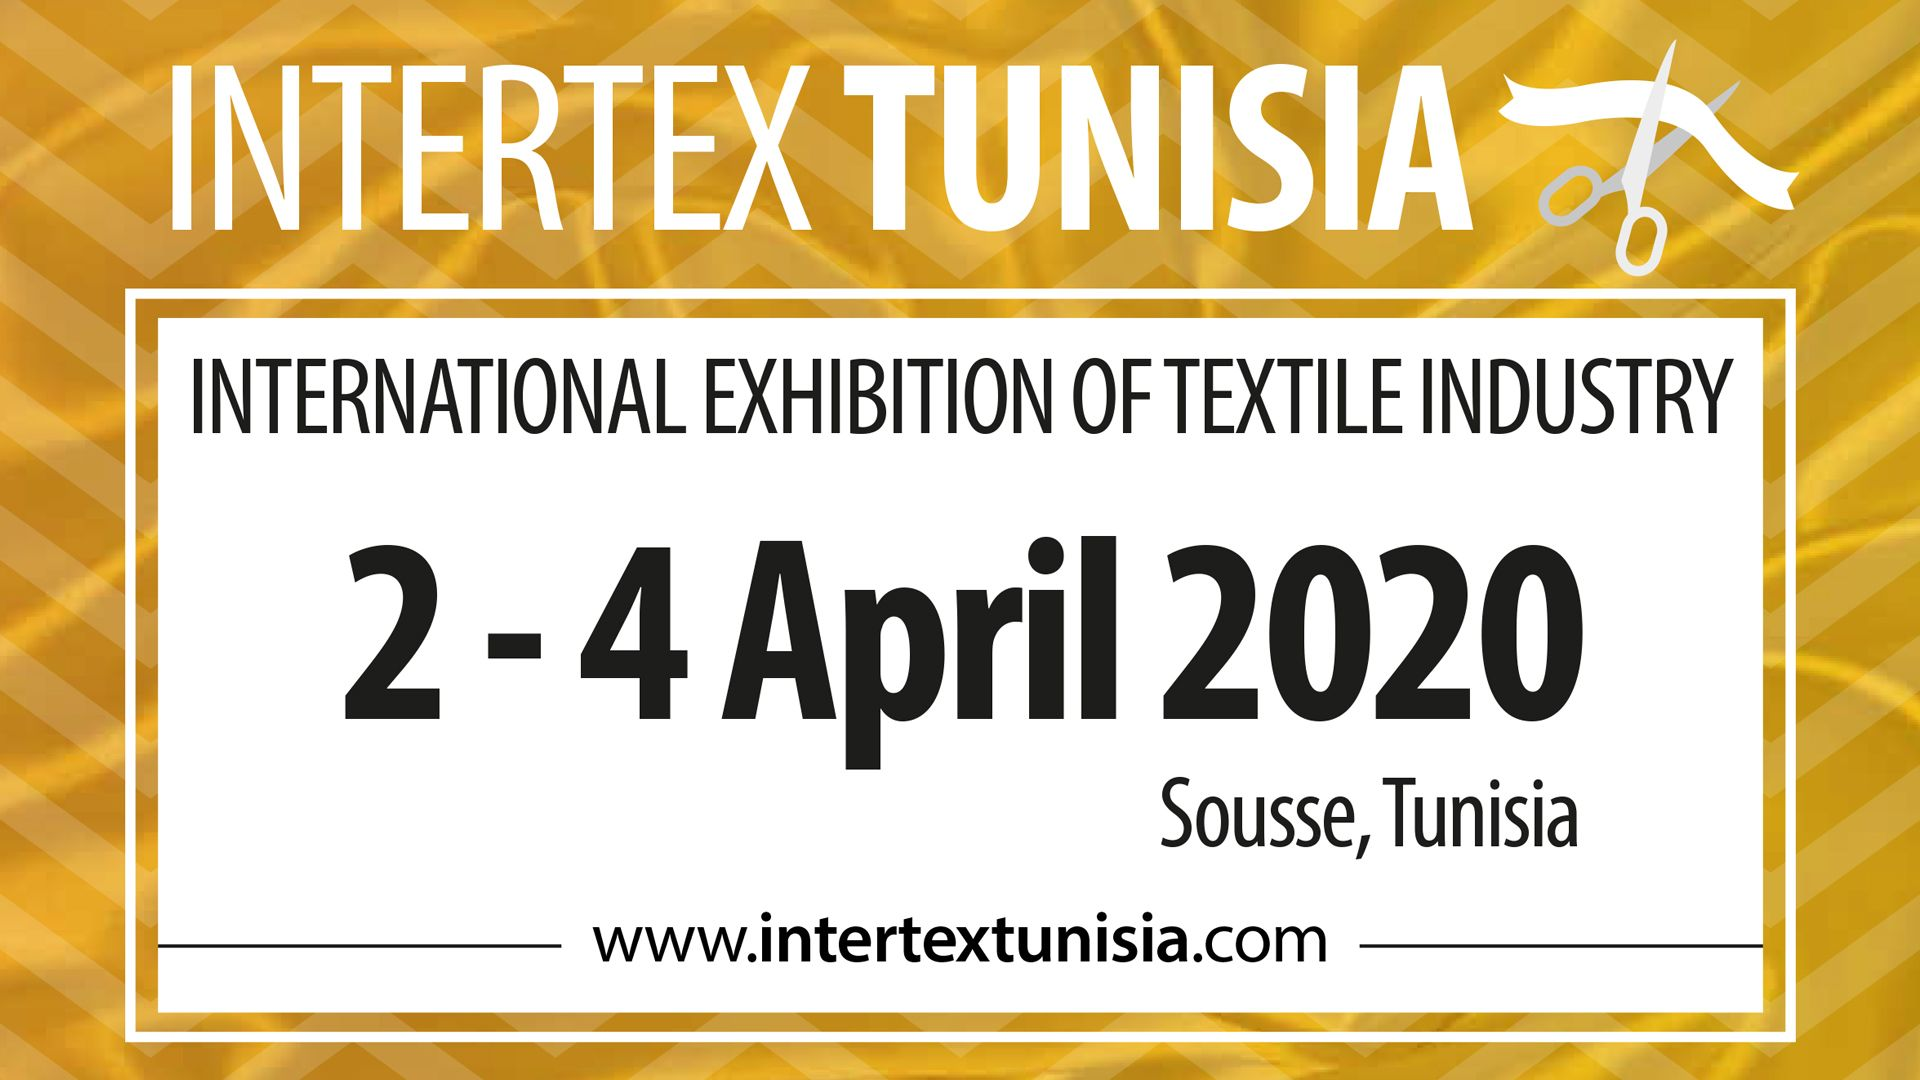 Intertex Tunisia 2020